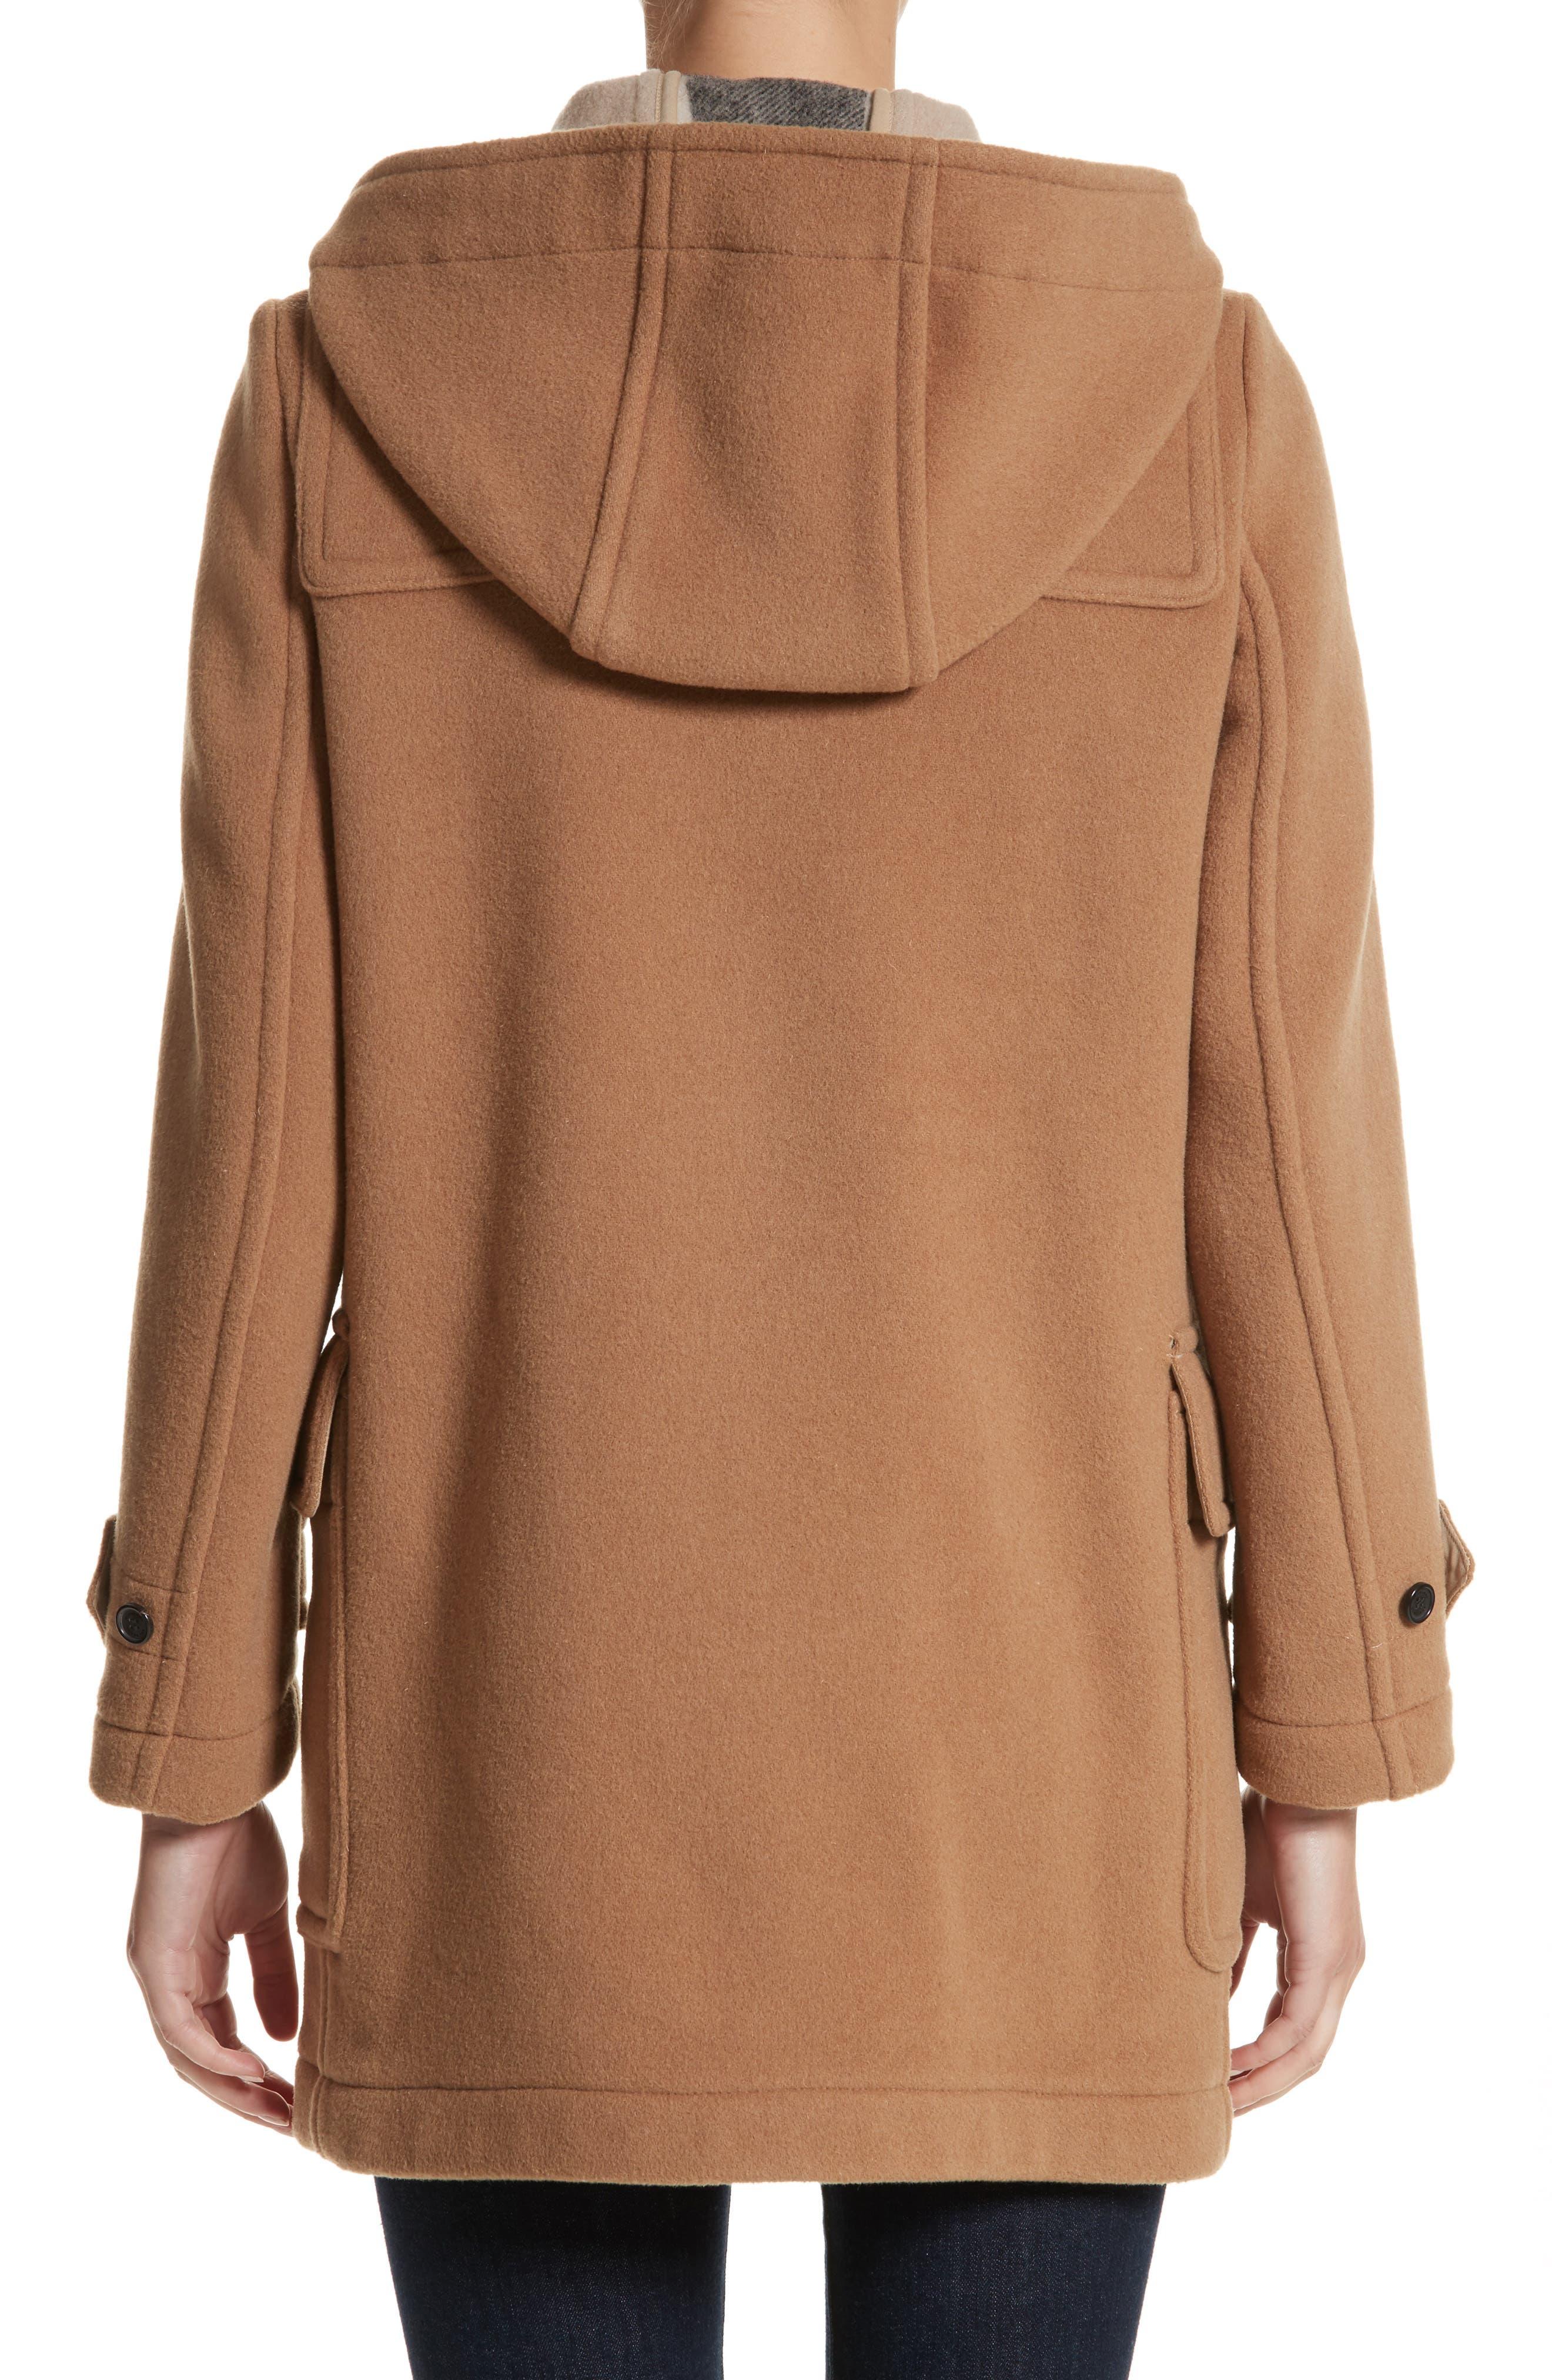 Mersey Wool Blend Duffle Coat,                             Alternate thumbnail 2, color,                             Mid Camel